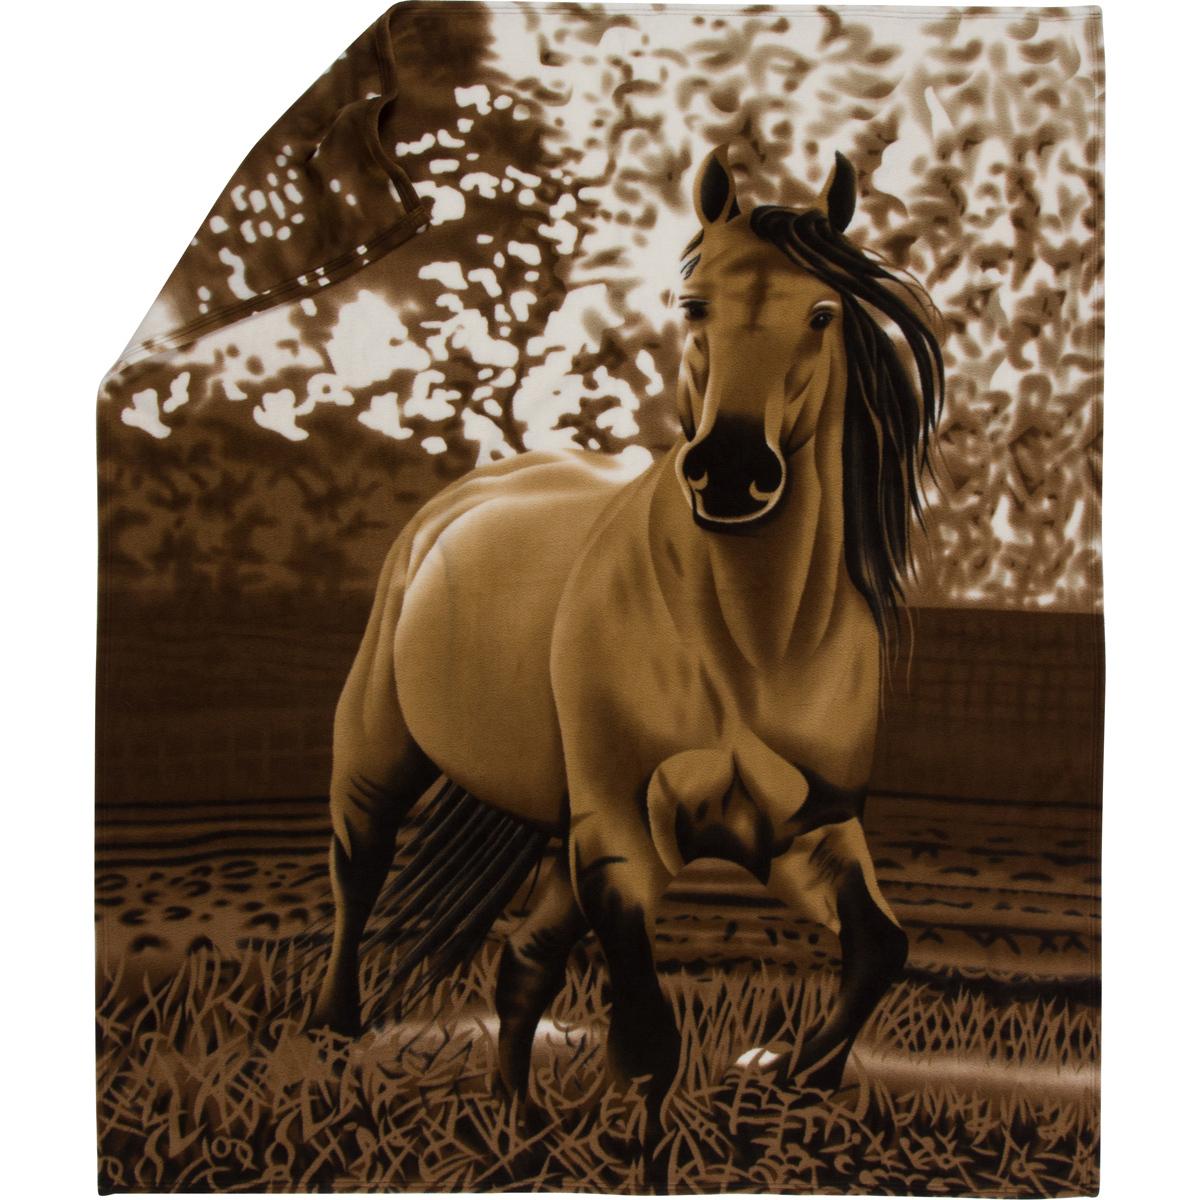 Western Buckskin Horse Fleece Throw Blanket - Gift Ready, Premium Upgrade - $46.95